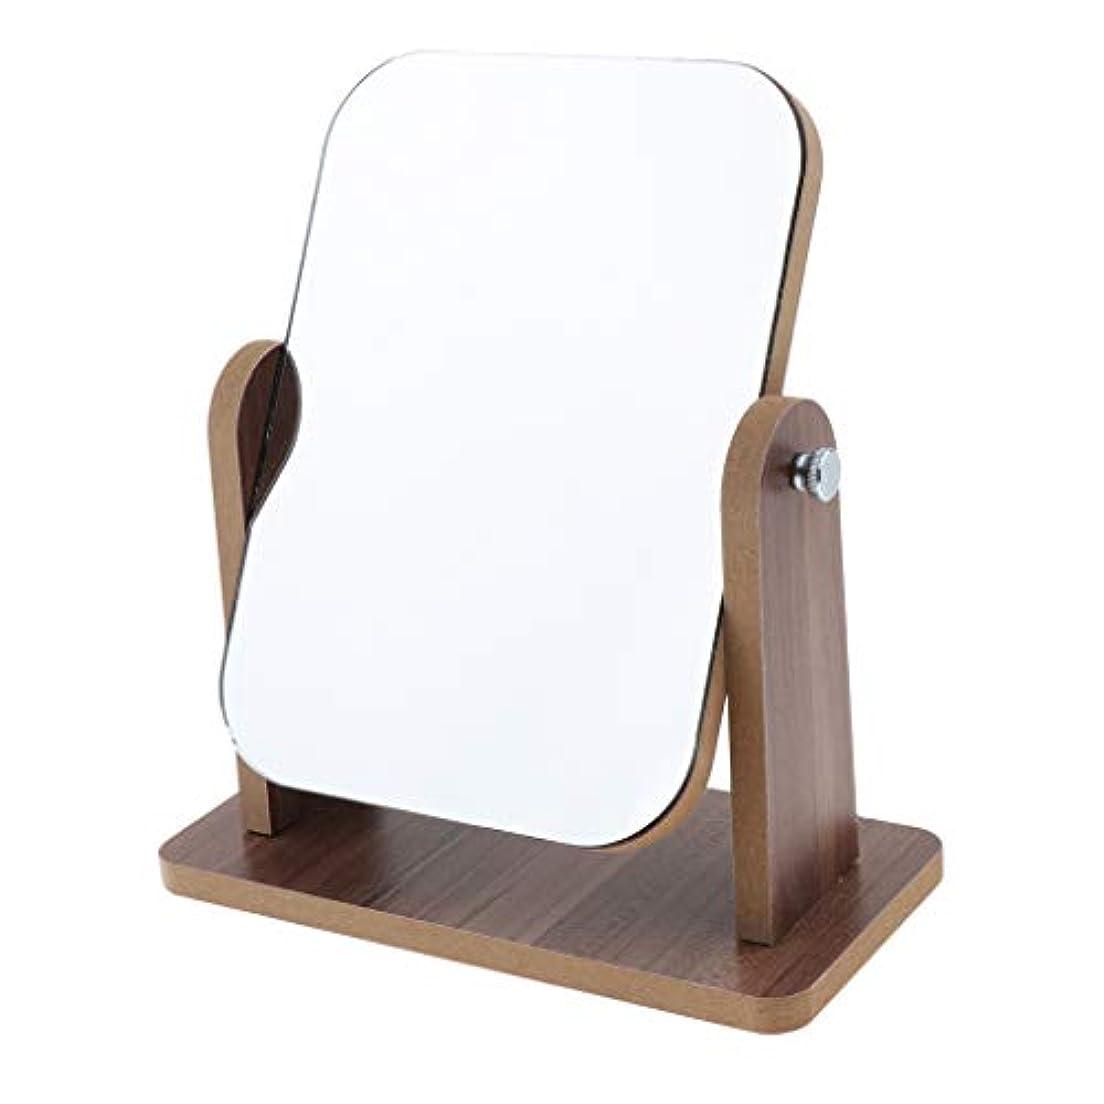 住所陰気運営卓上化粧鏡 木製フレーム 自立型 鏡 デスクトップ 高精細 化粧鏡 調整可能 全3サイズ - 小